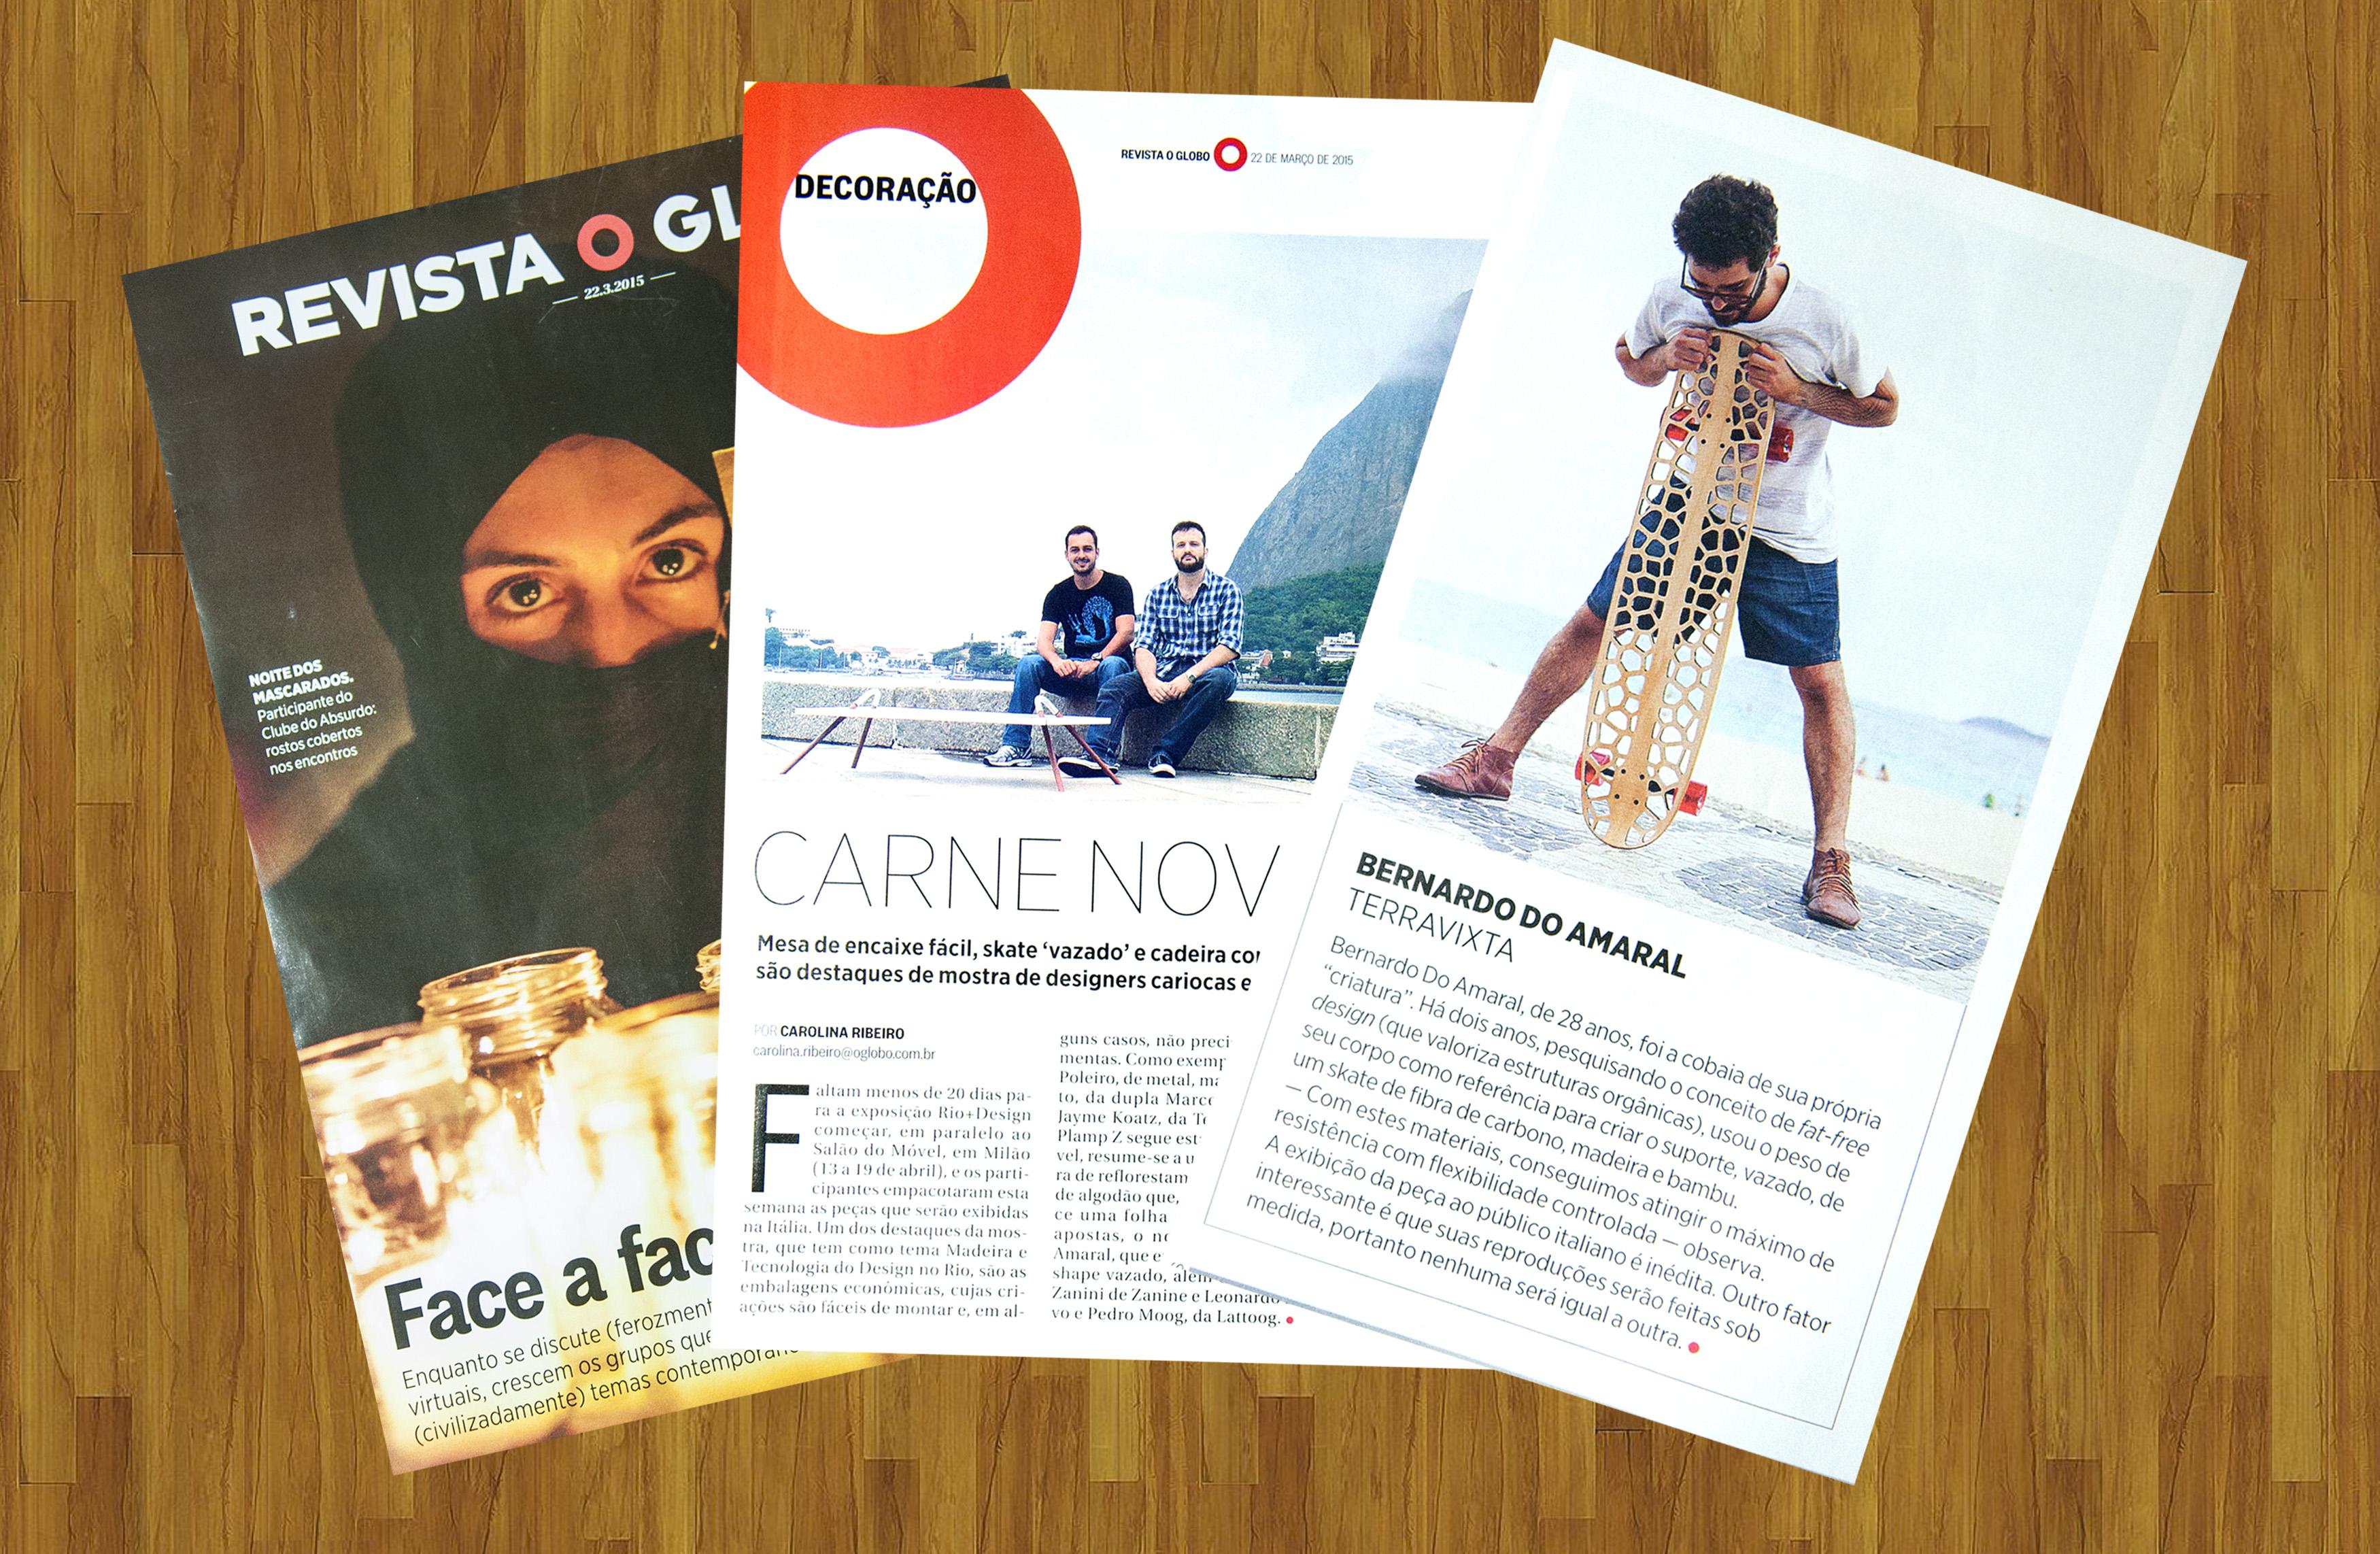 Voronoi na revista O Globo